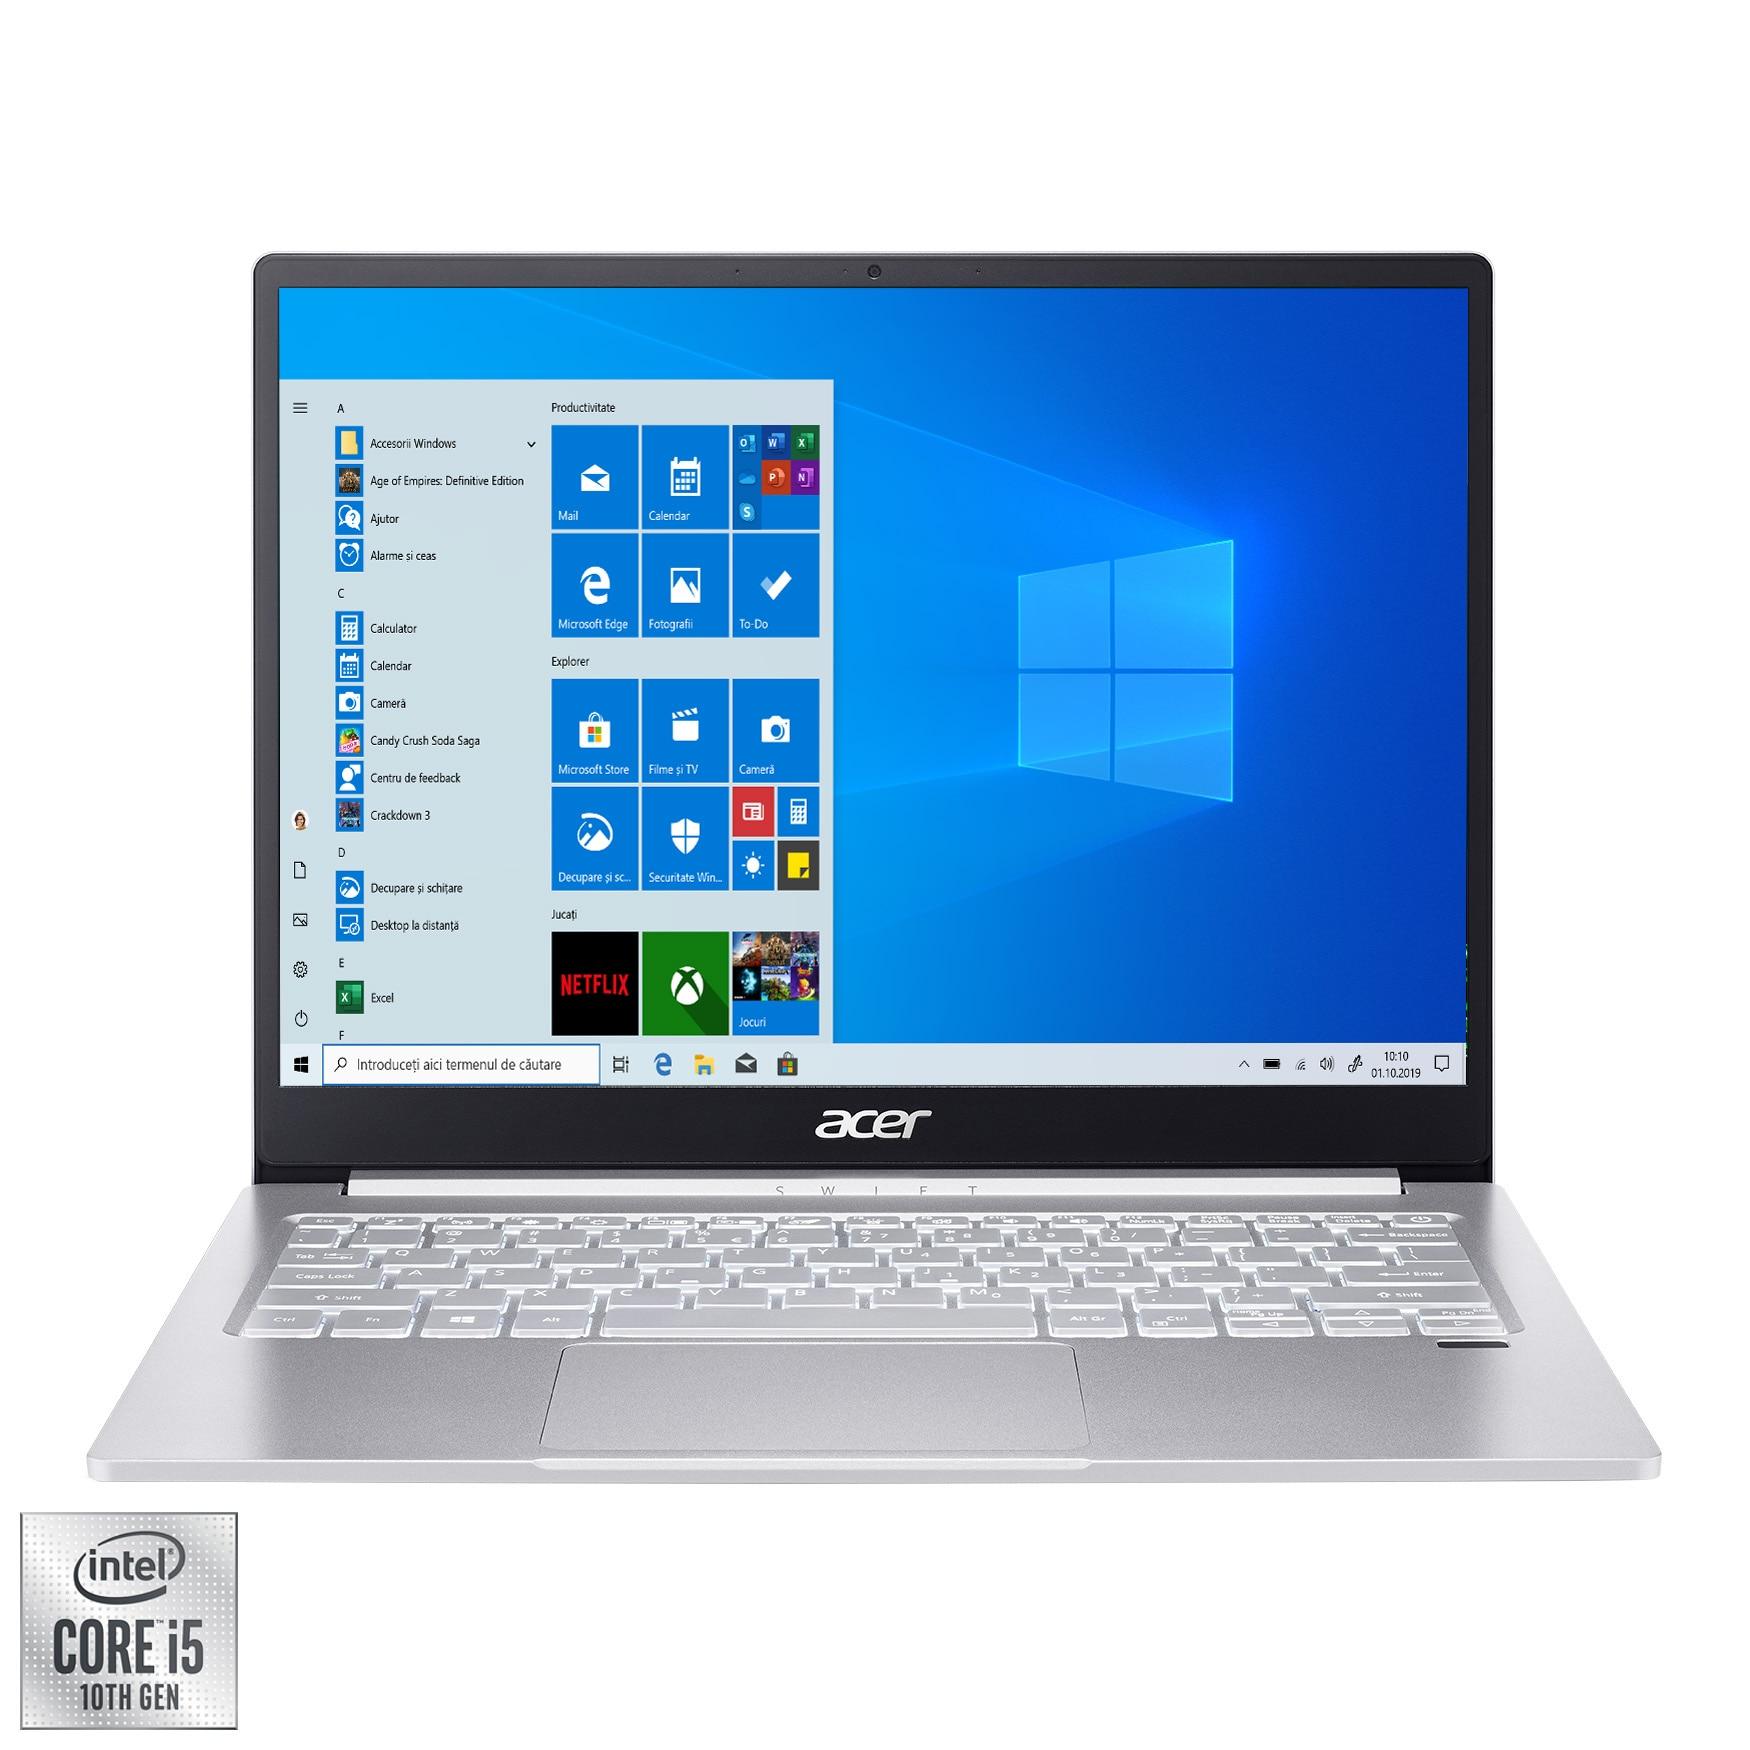 "Fotografie Laptop ultraportabil Acer Swift 3 SF313-52 cu procesor Intel® Core™ i5-1035G4 pana la 3.70 GHz, 13.5"", QHD, 8GB, 512GB SSD, Intel UHD Graphics, Windows 10 Pro, Silver"